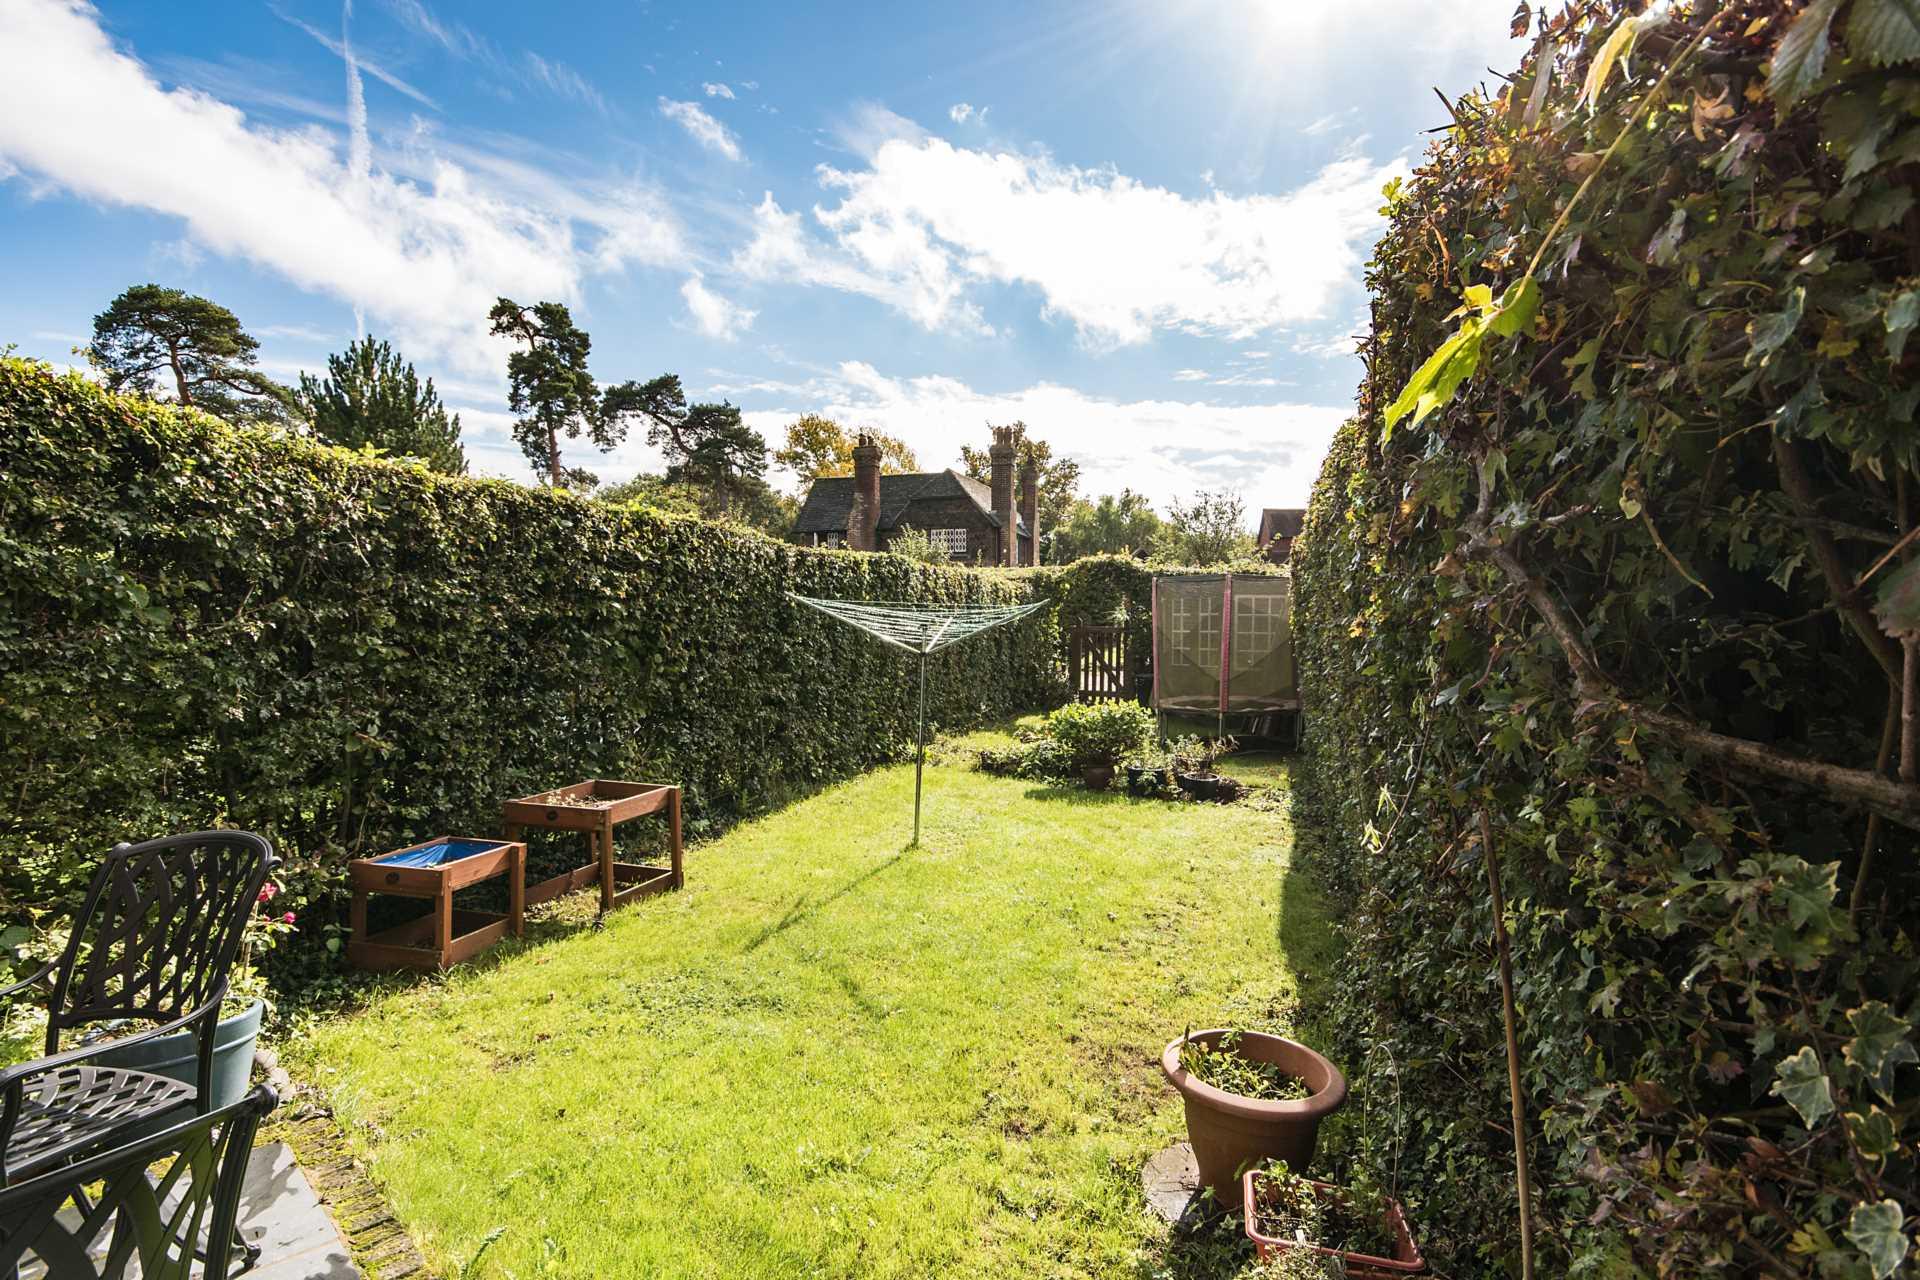 Home Farm Close, Leigh, Tonbridge, Image 13